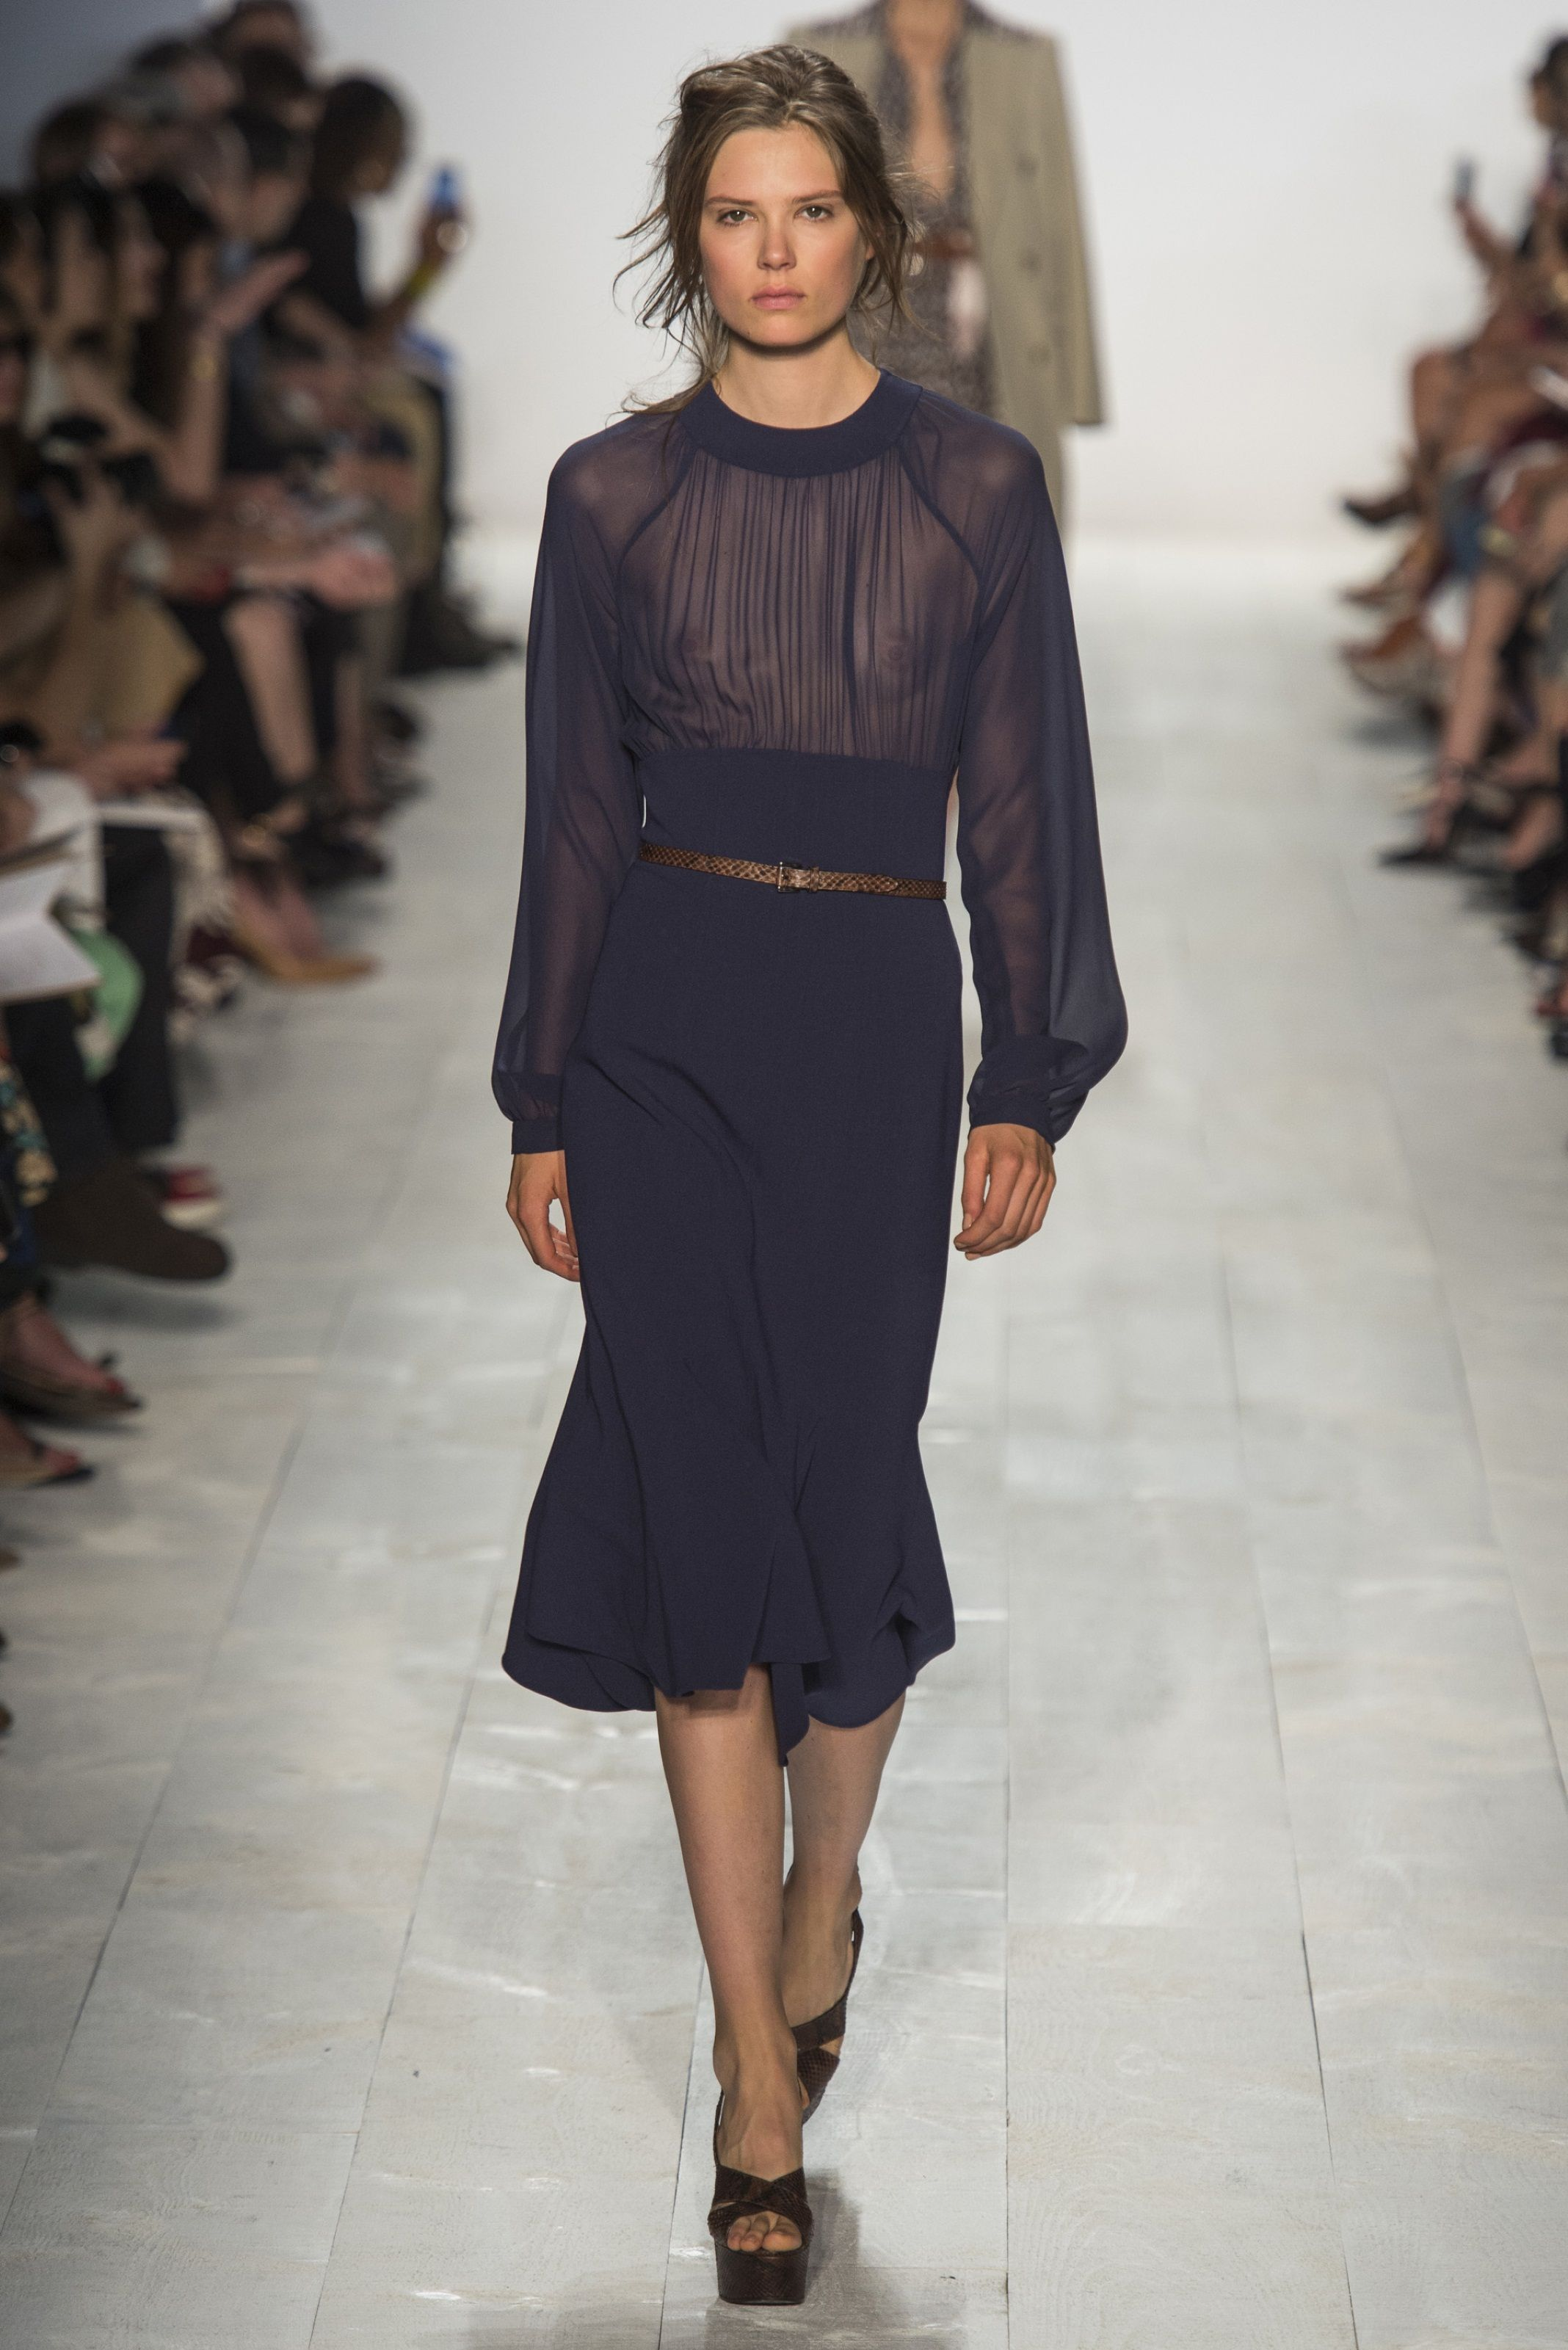 Sfilata Michael Kors New York - Collezioni Primavera Estate 2014 - #Vogue #nyfw #ss2014 #MichaelKors